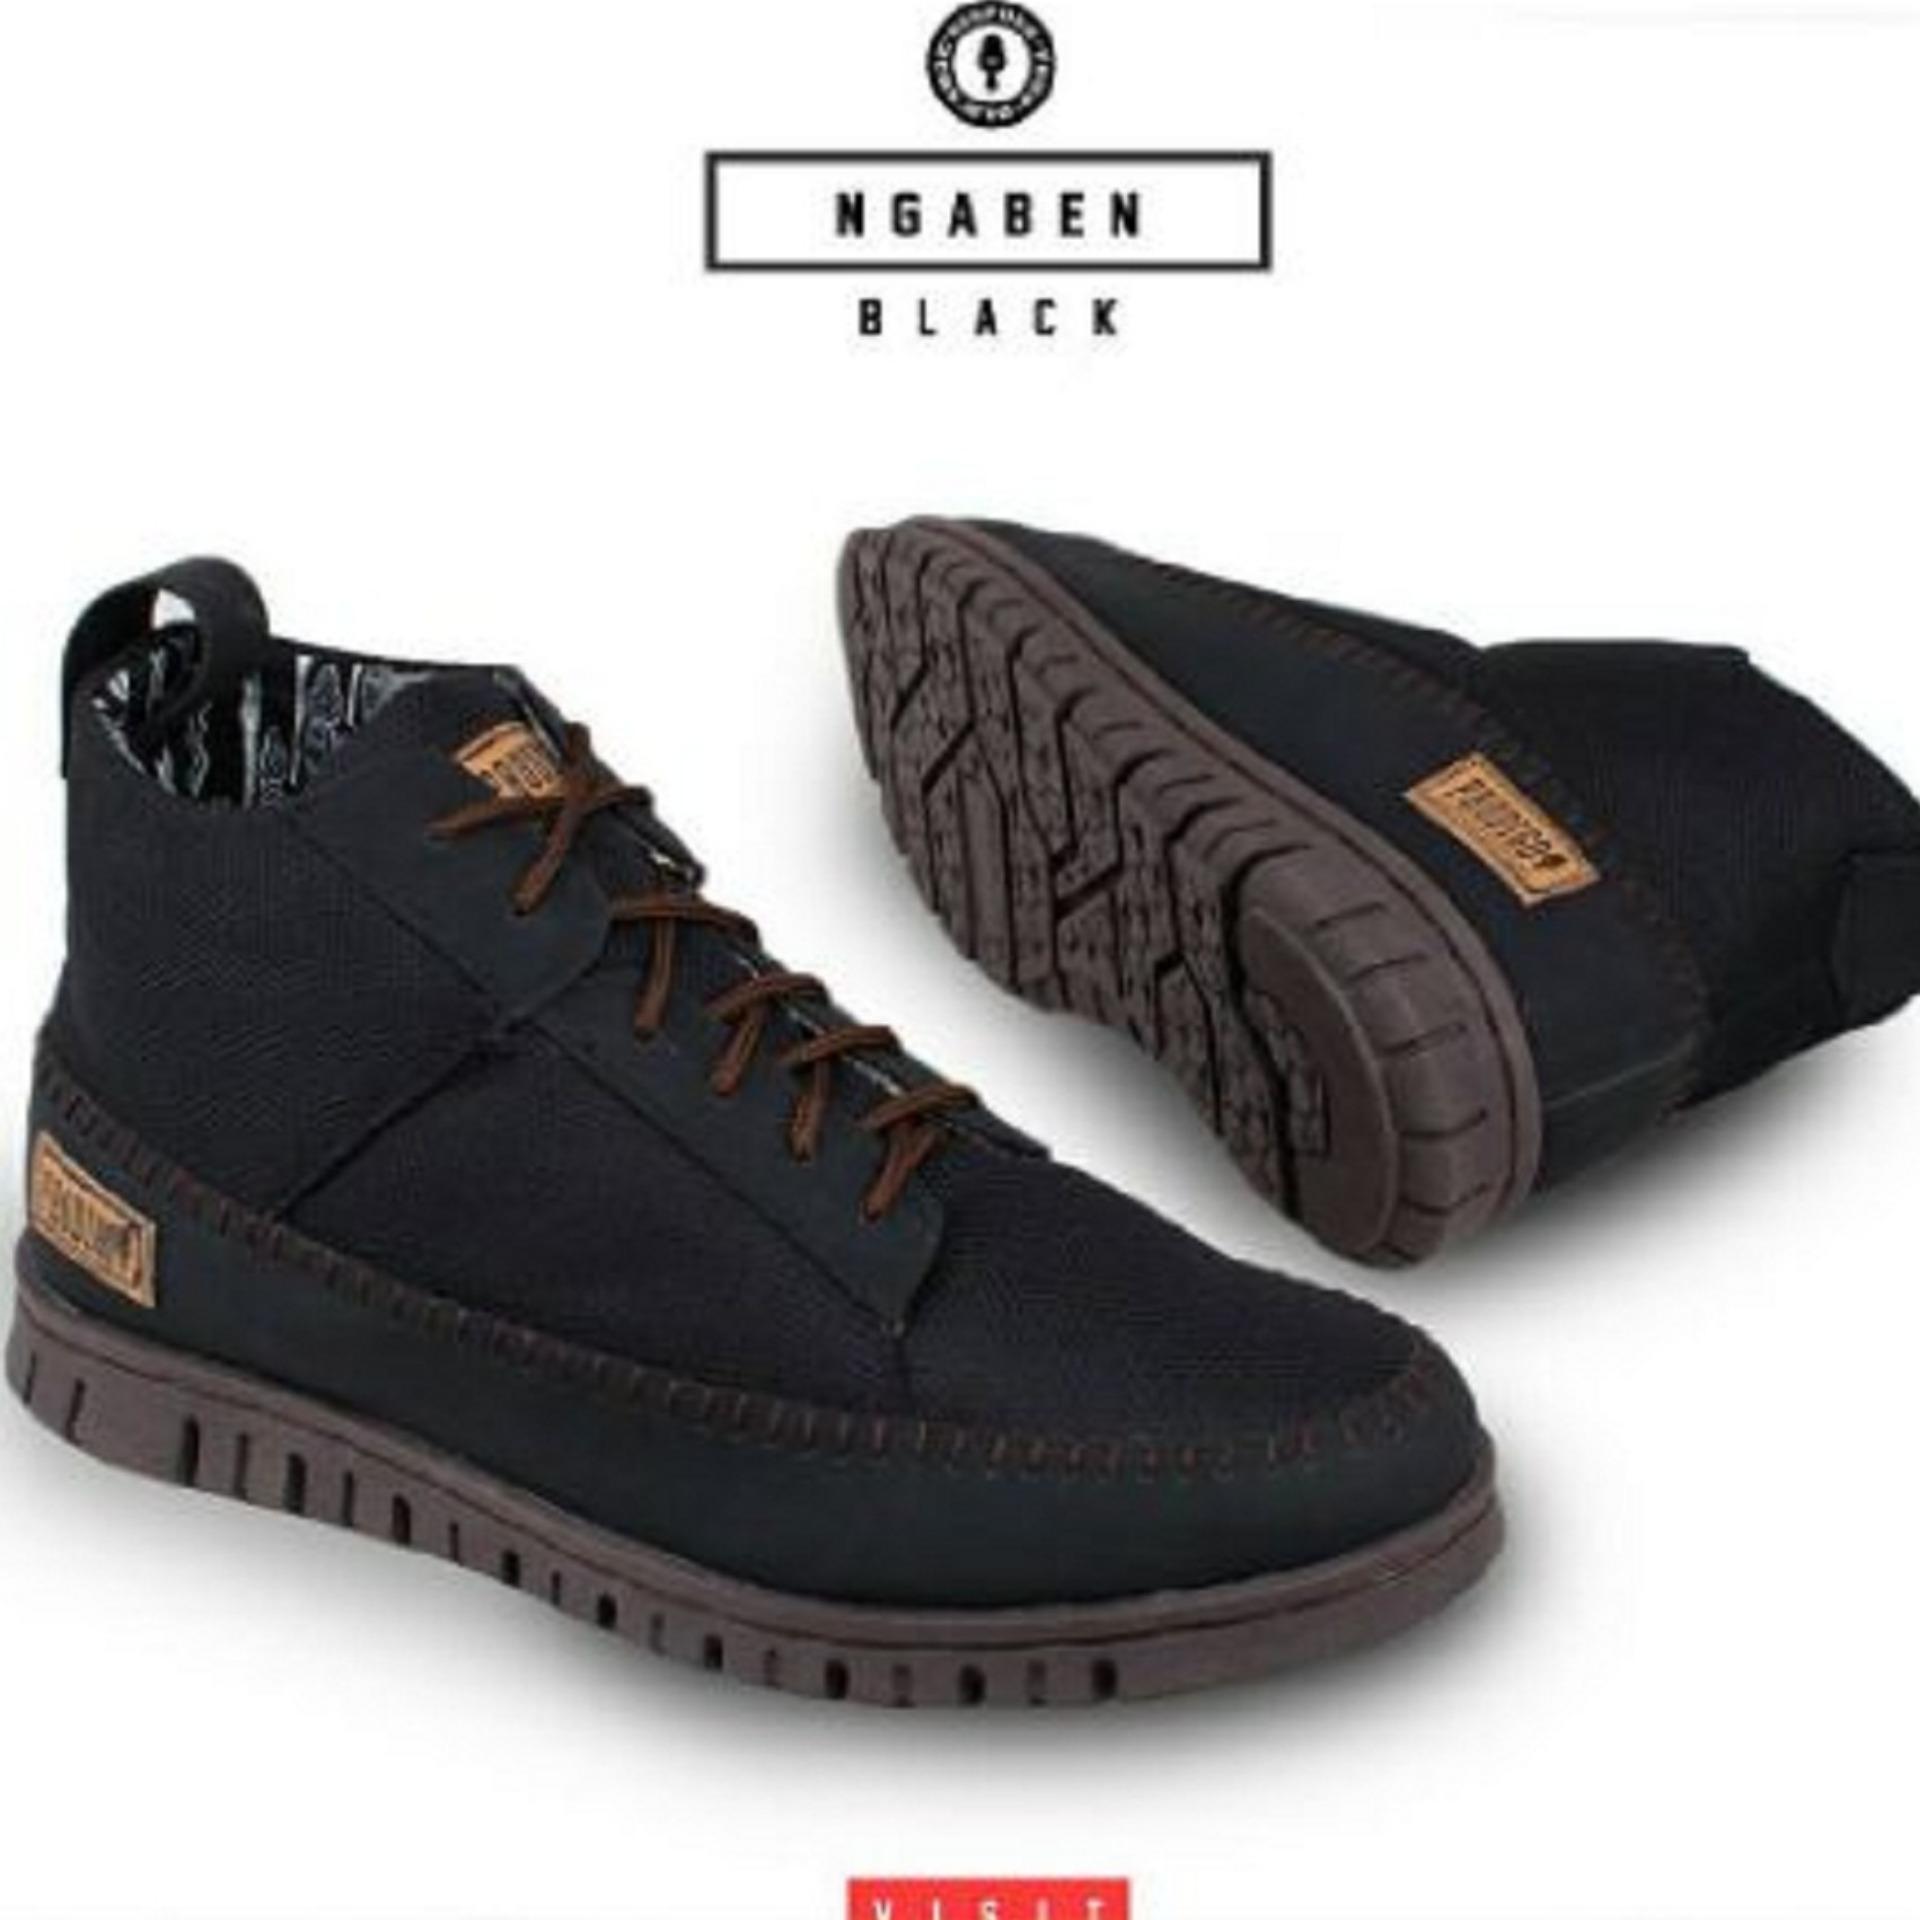 Harga Termurah Sepatu Sneakers High Pria Prodigo Ngaben Black Catenzo Super